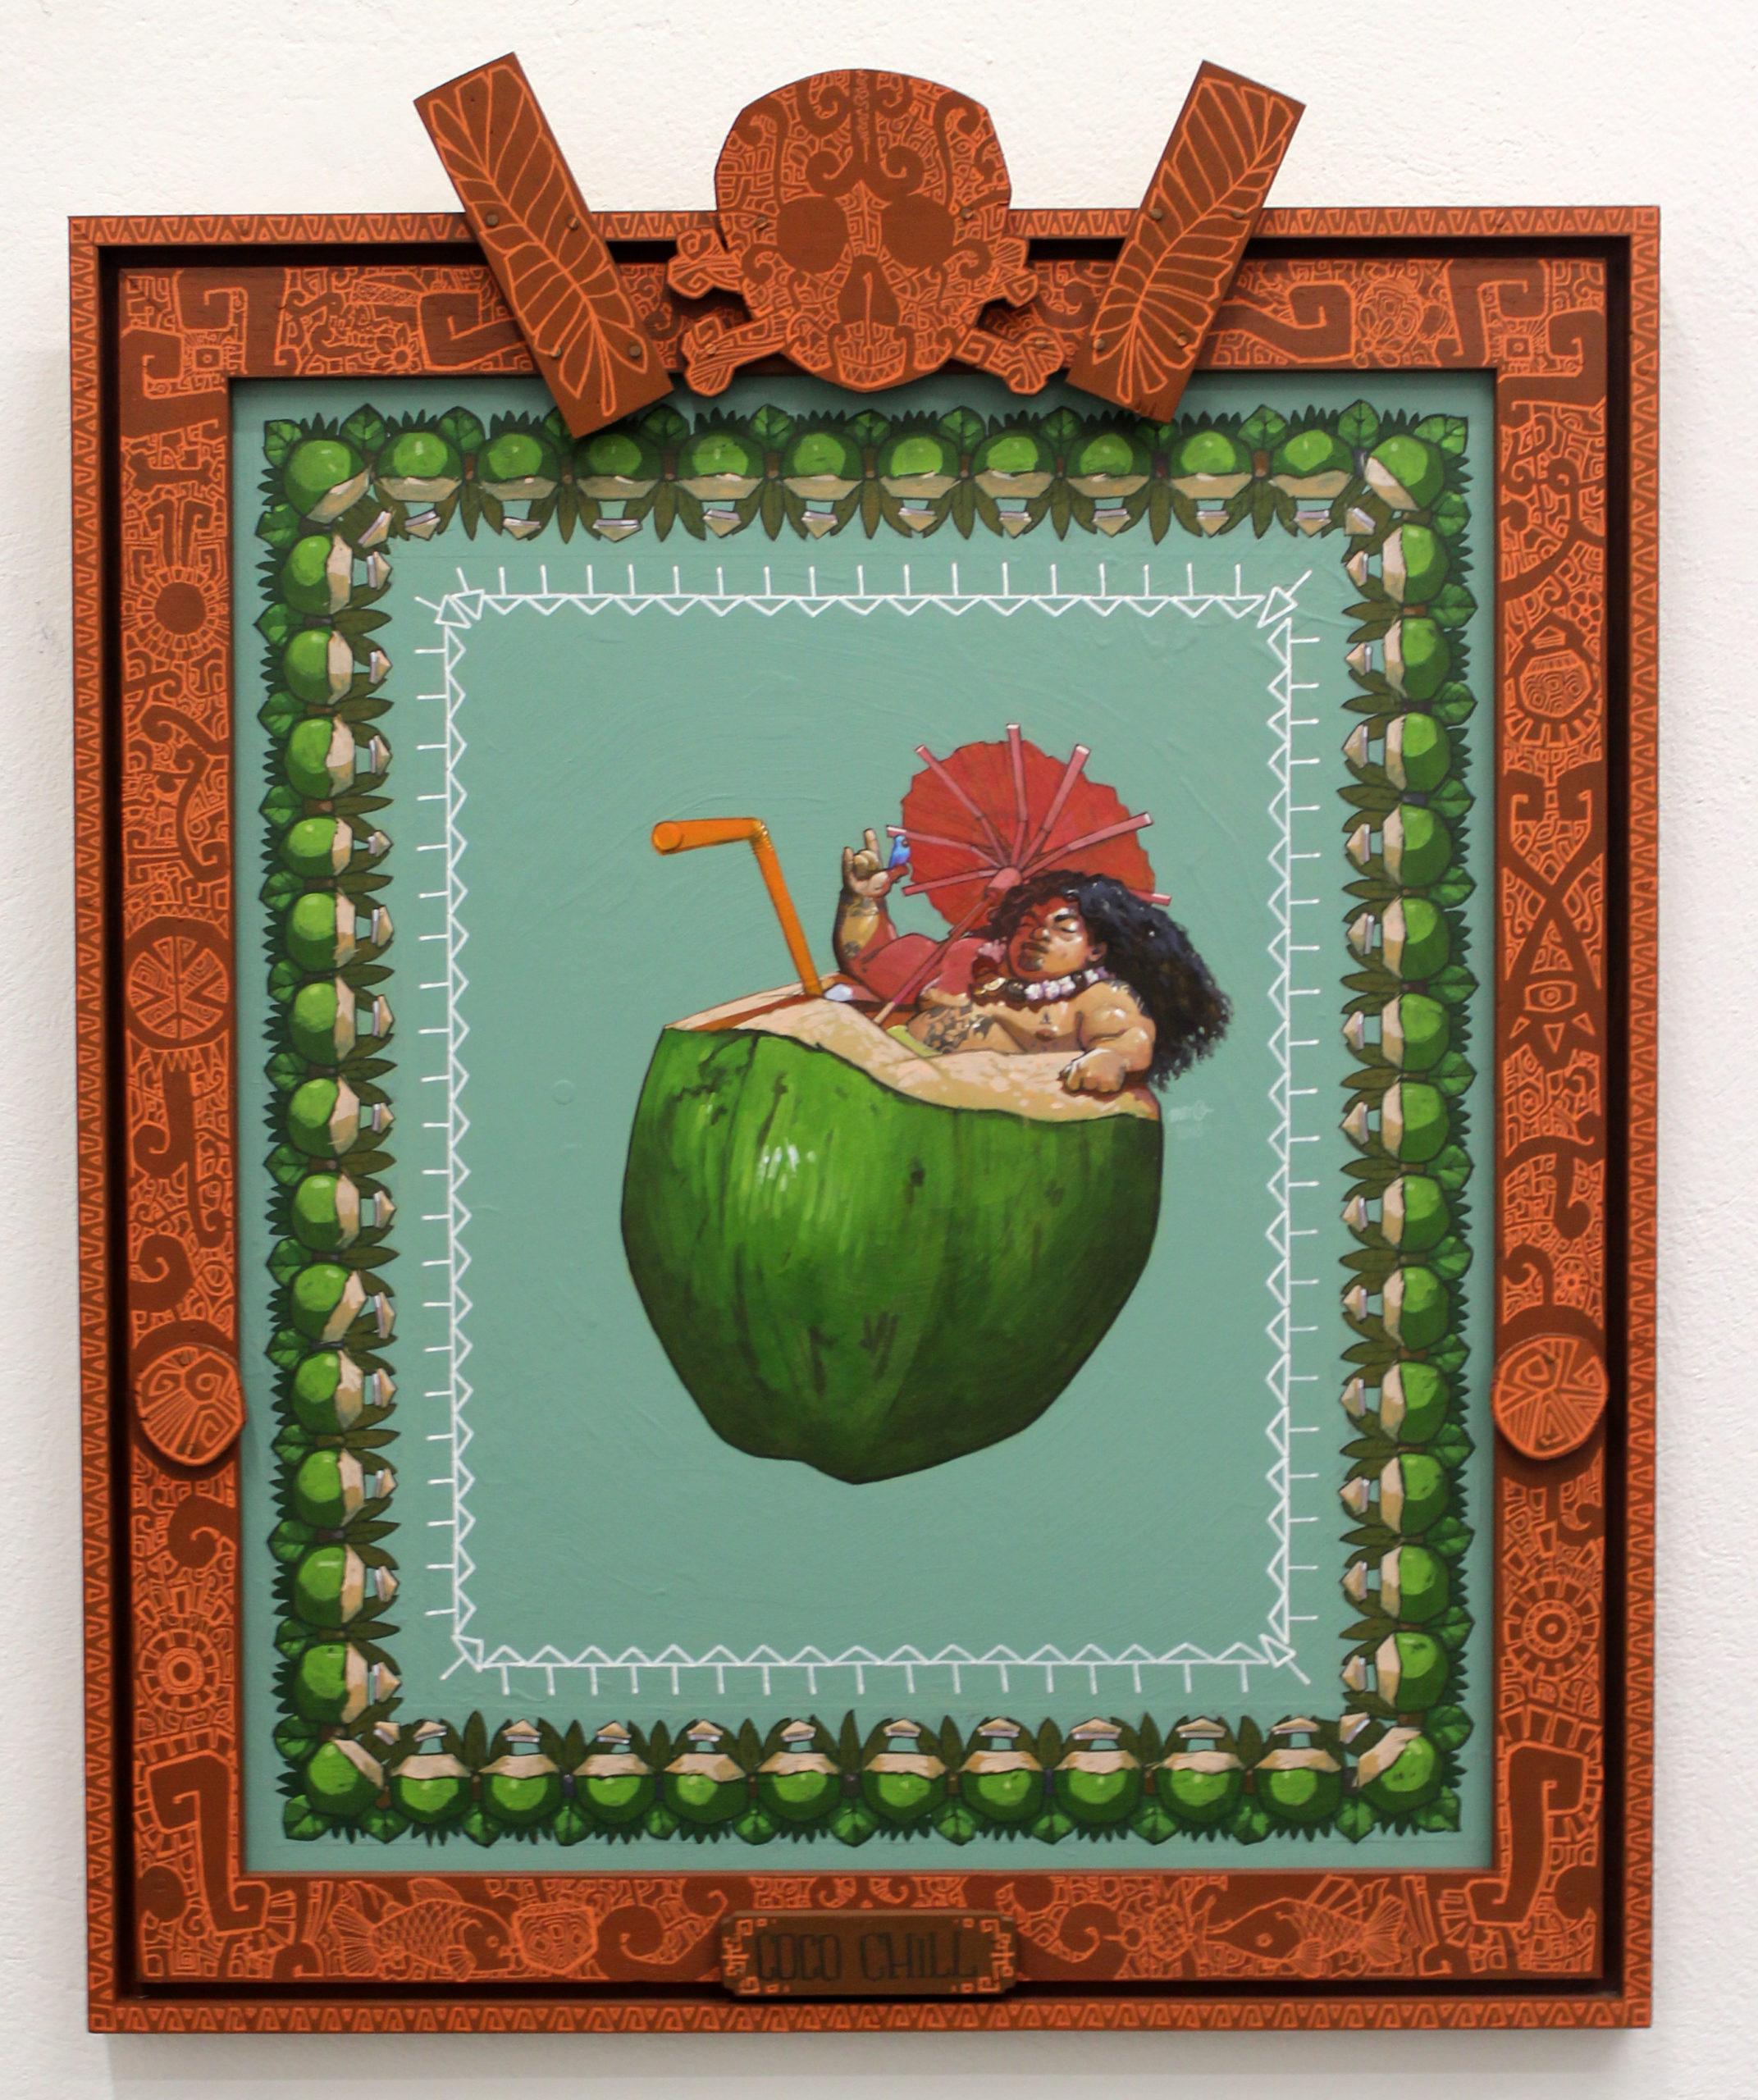 Coco Chill (Marco Lallemant) | Géopol'art 2021